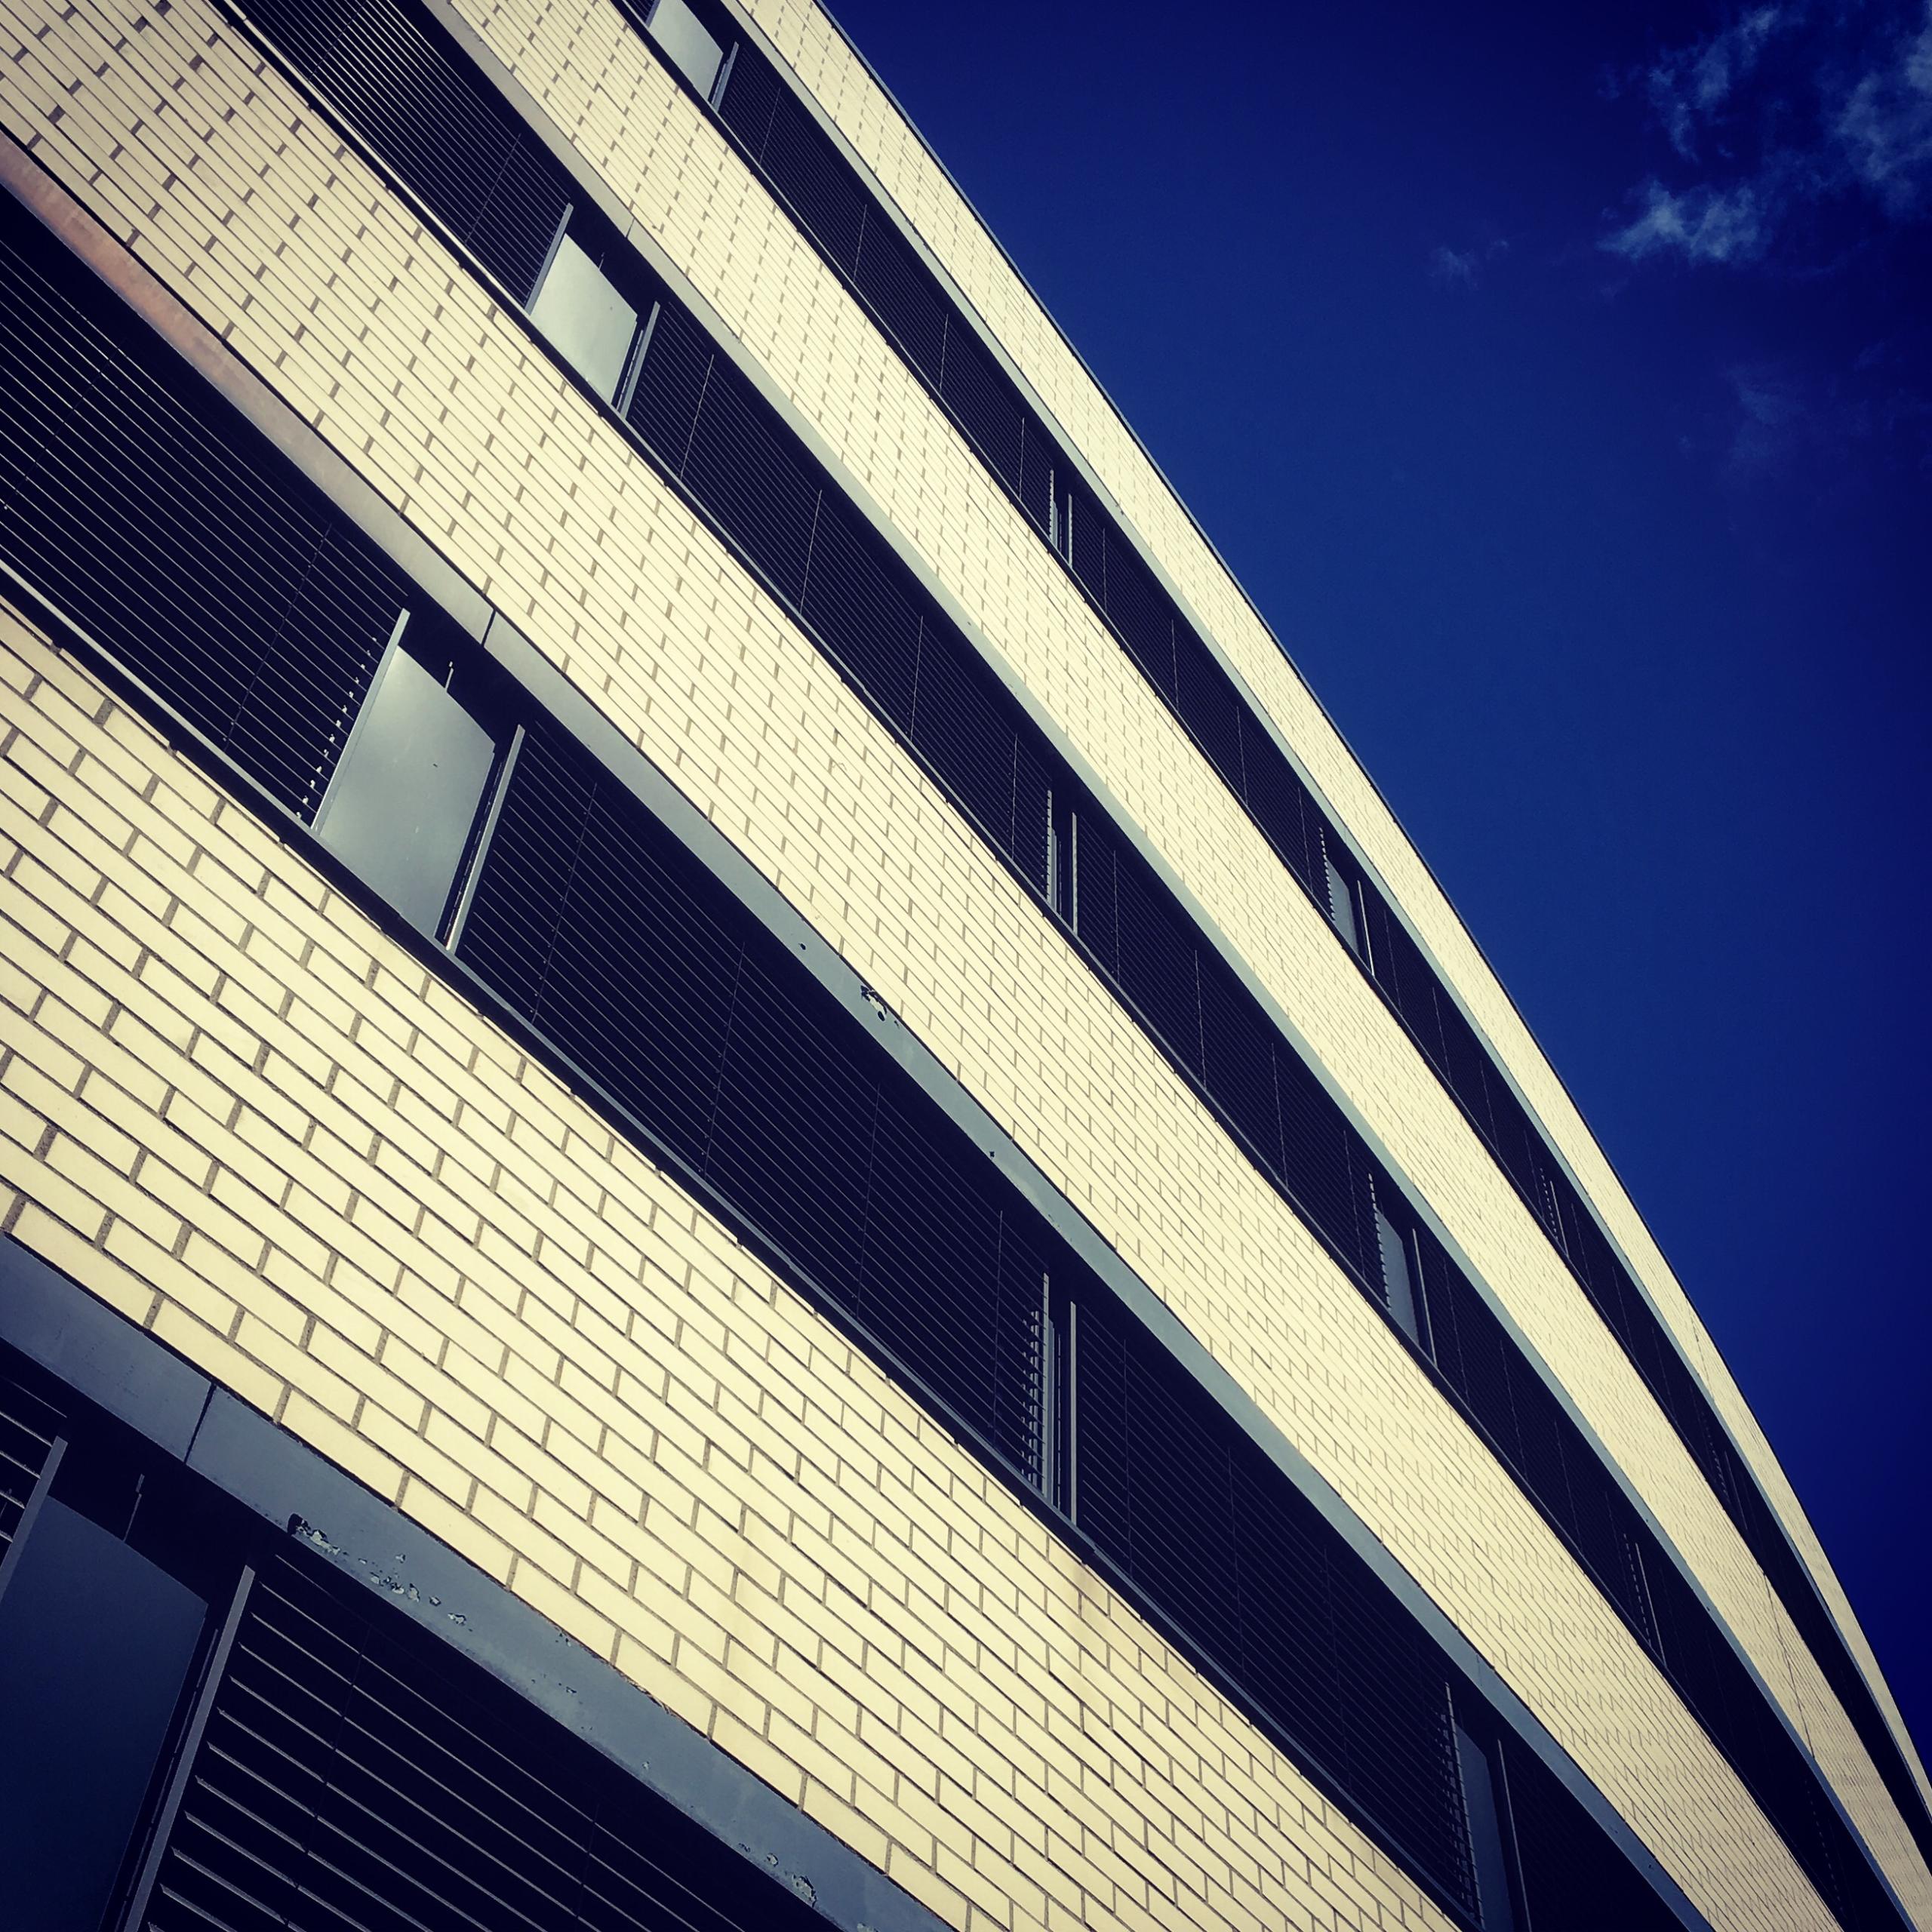 building - architecture, buildings - stigergutt | ello